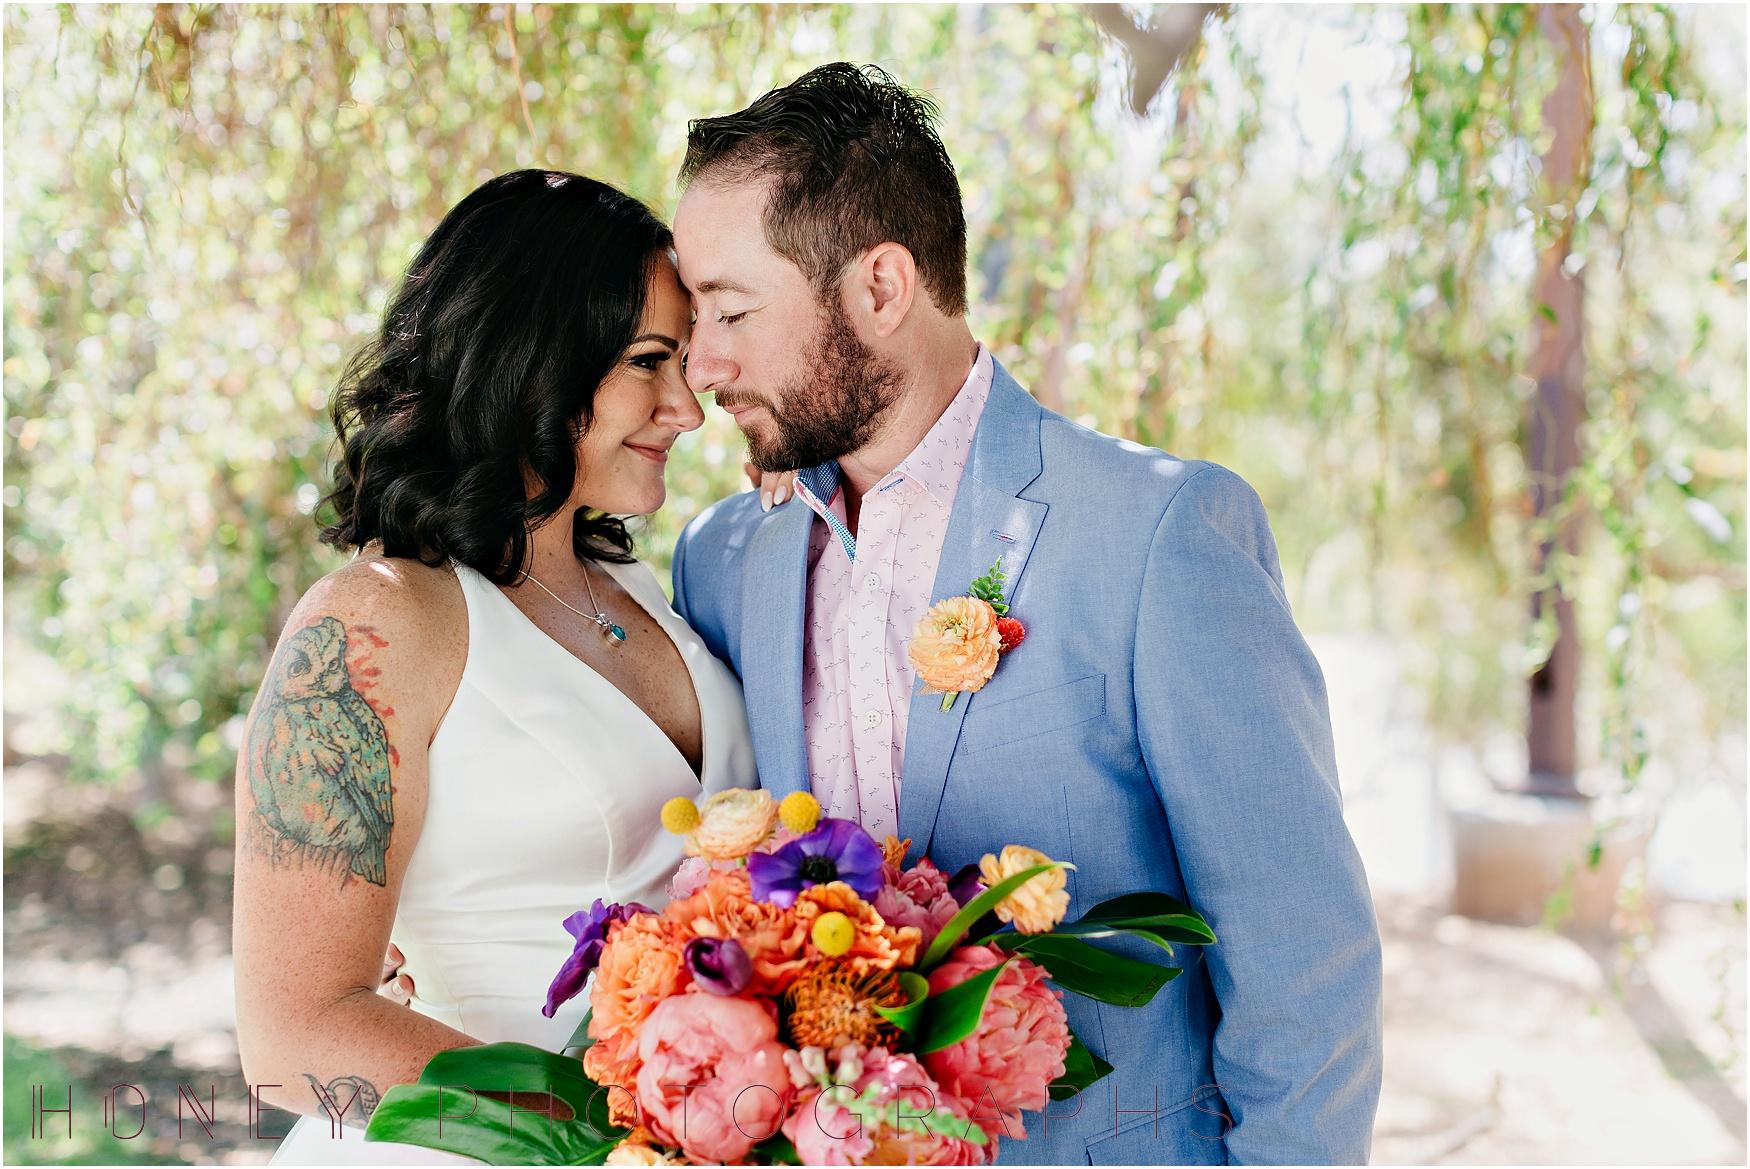 colorful_ecclectic_vibrant_vista_rainbow_quirky_wedding032.jpg